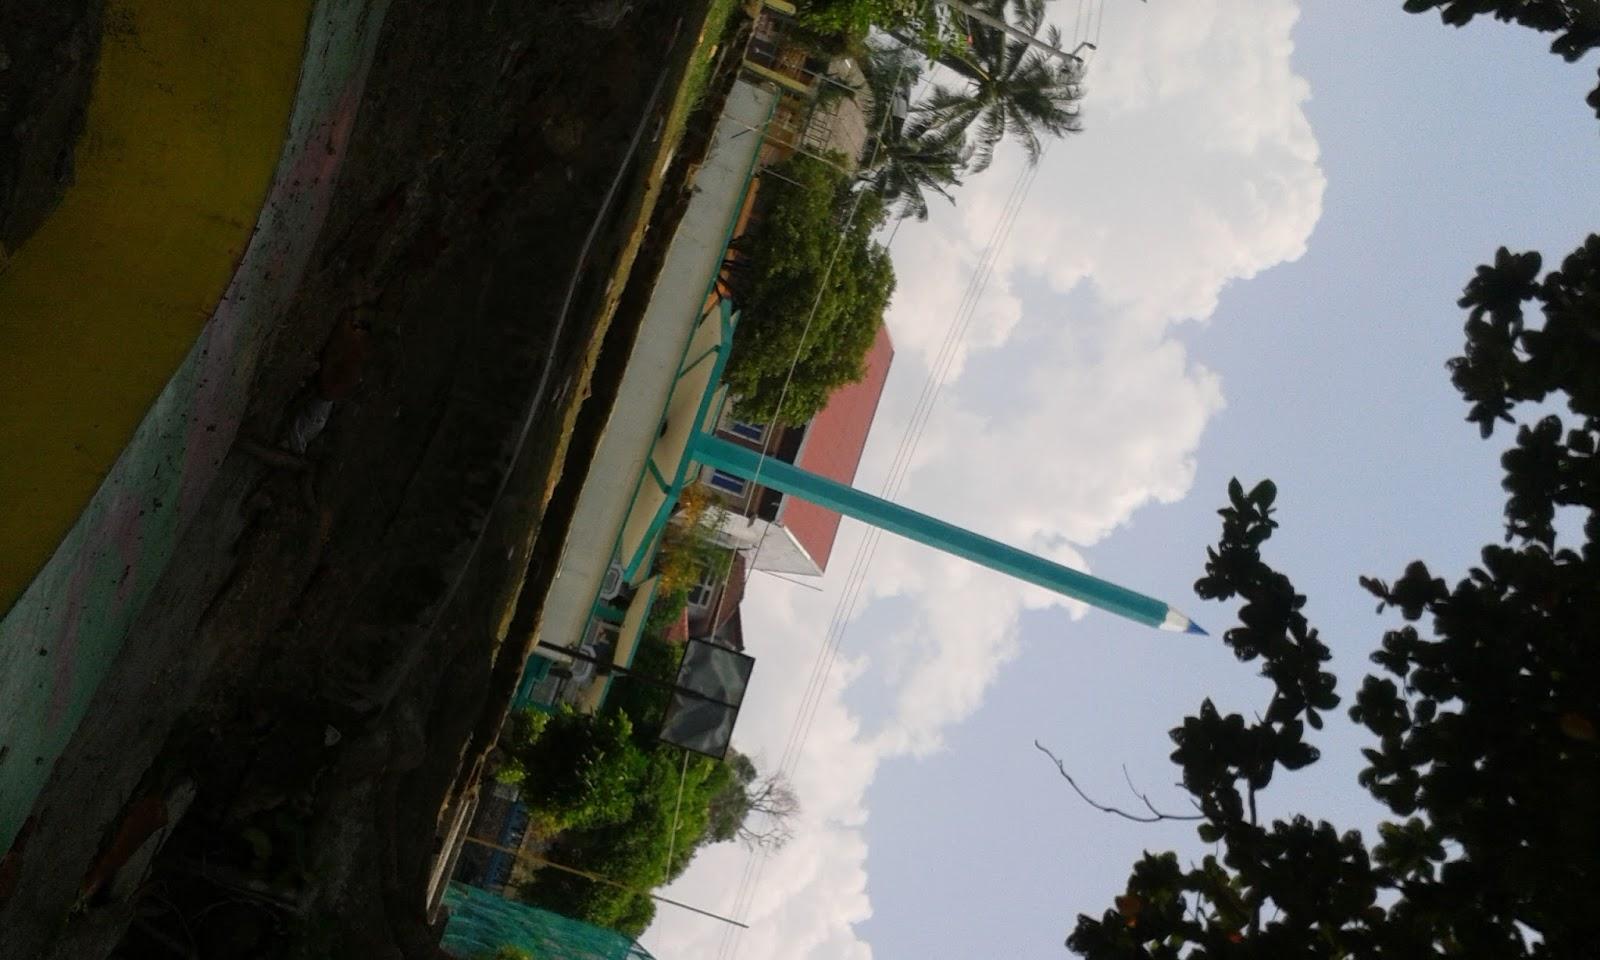 Mylife Taman Tugu Pensil Tanjungpinang Aaaah Gambar Nggak Tegak Yaa